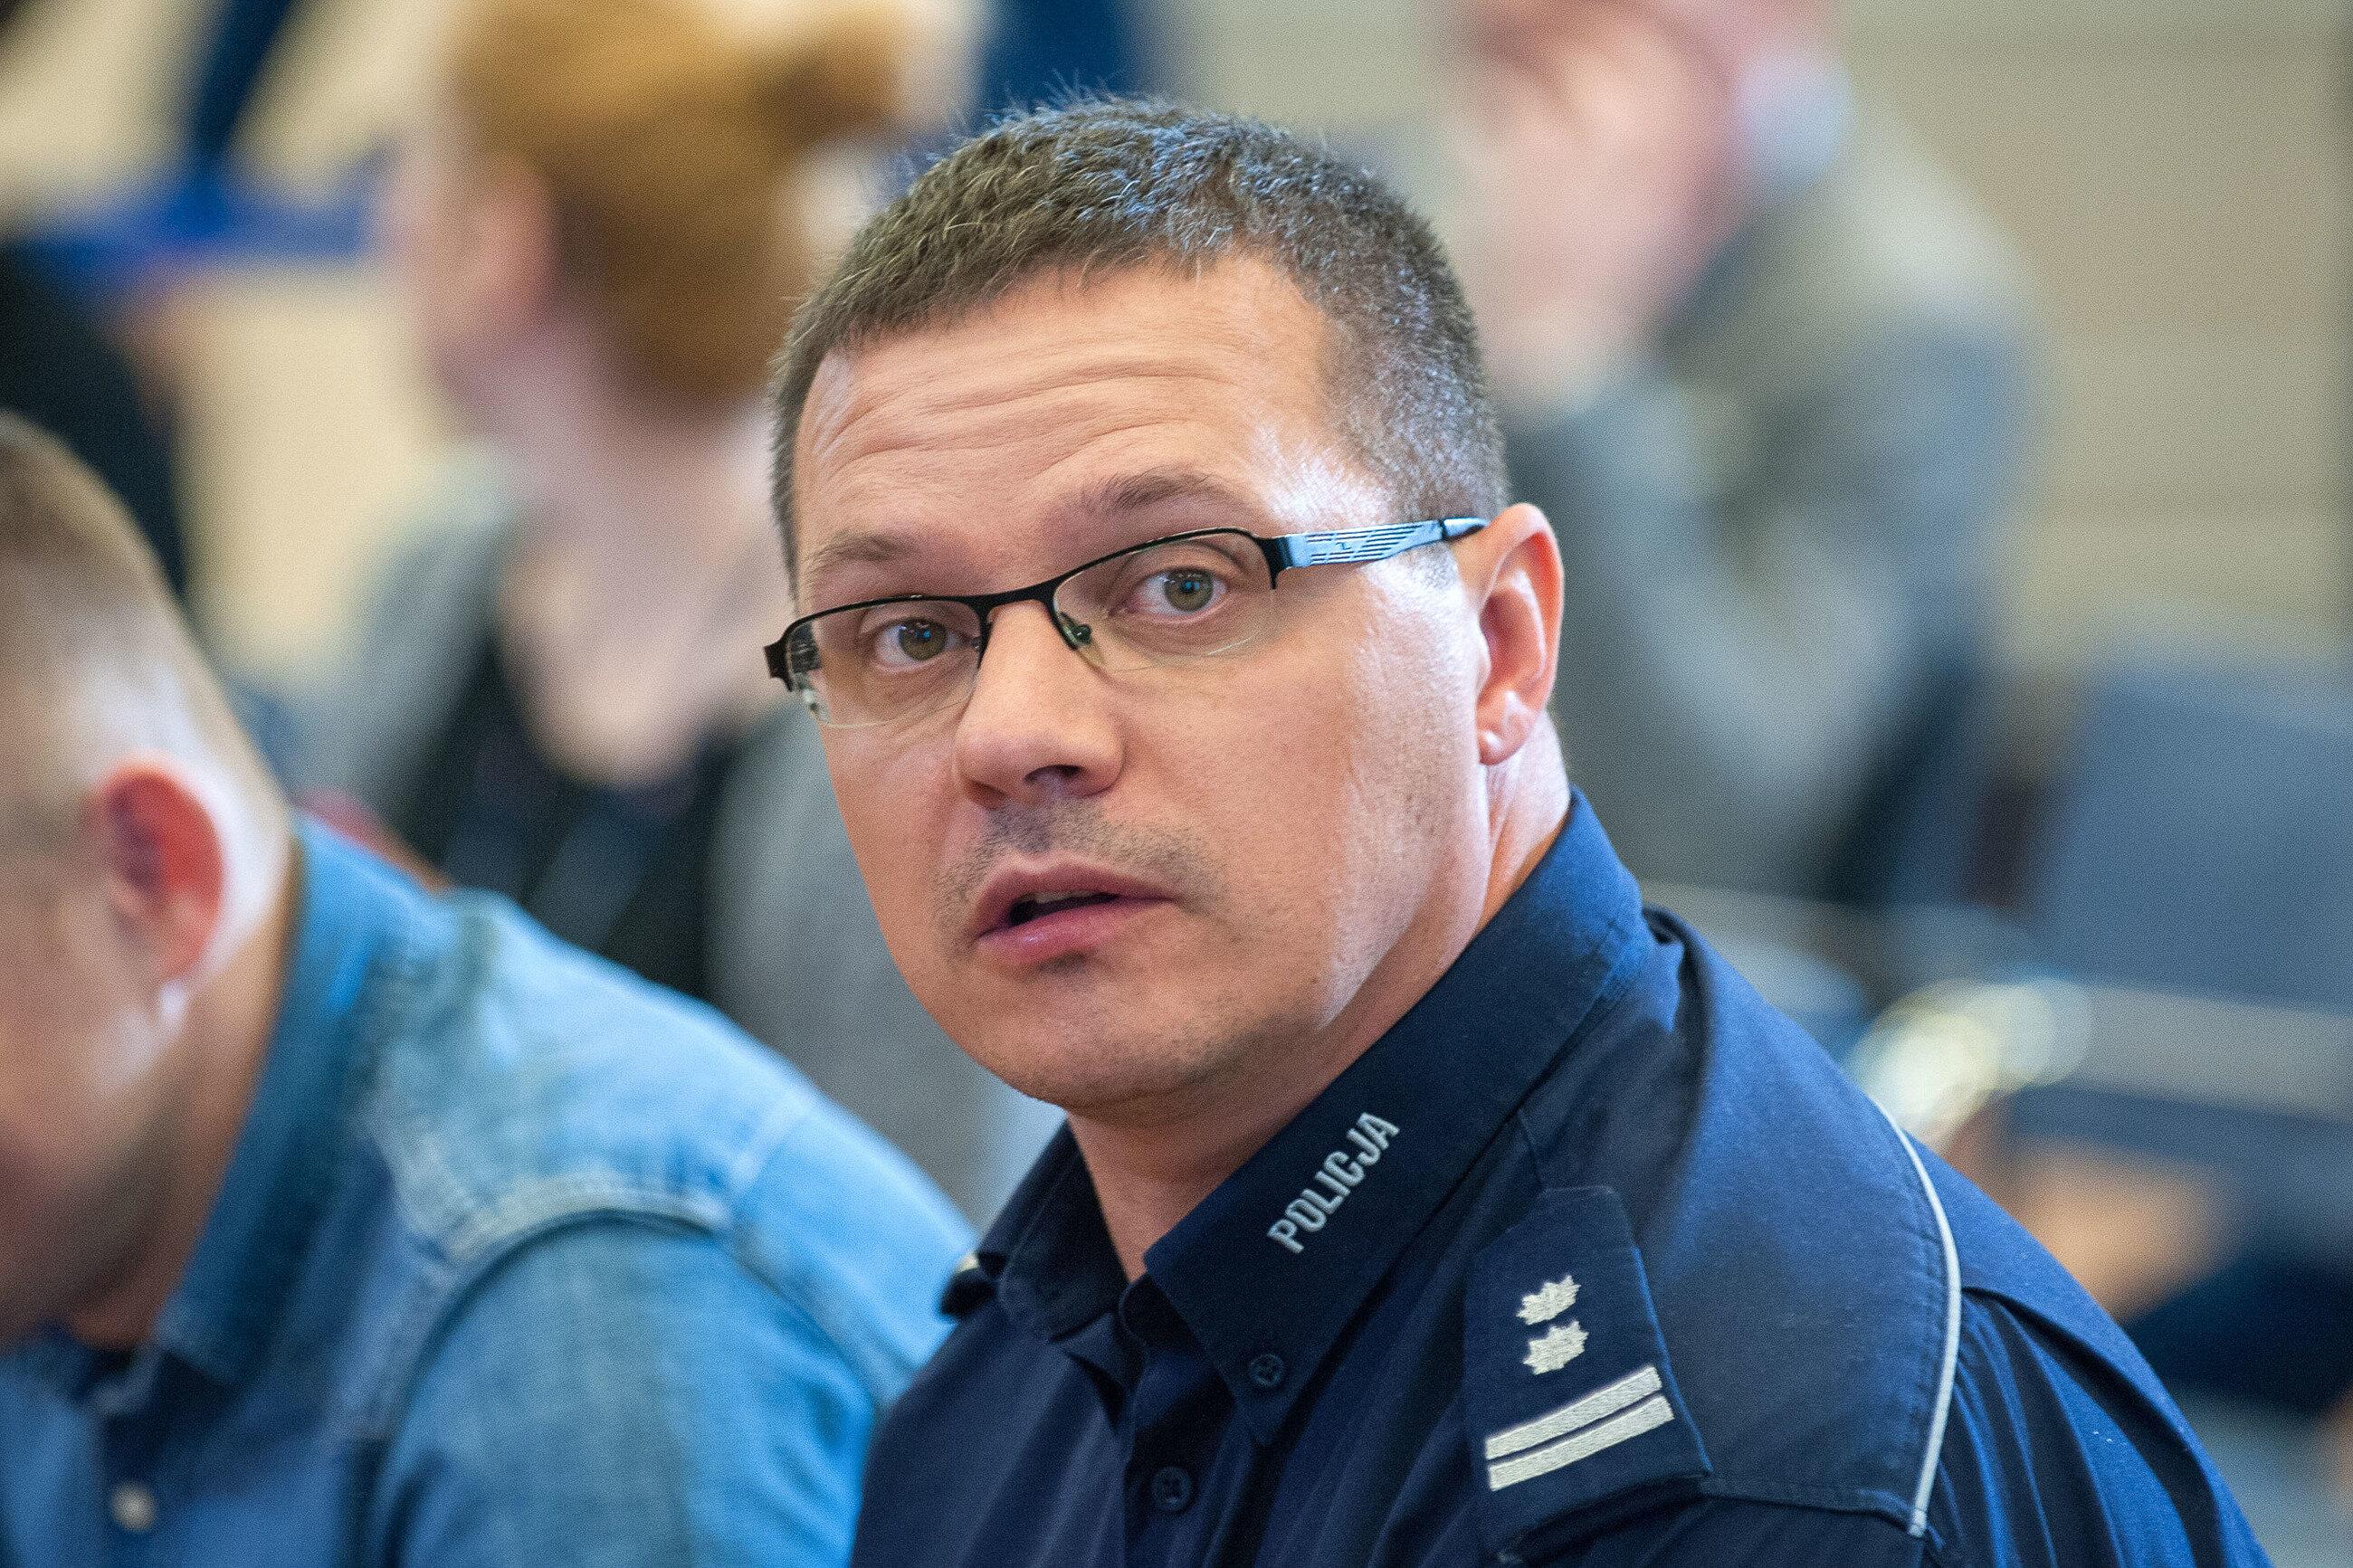 Rzecznik KGP Mariusz Ciarka